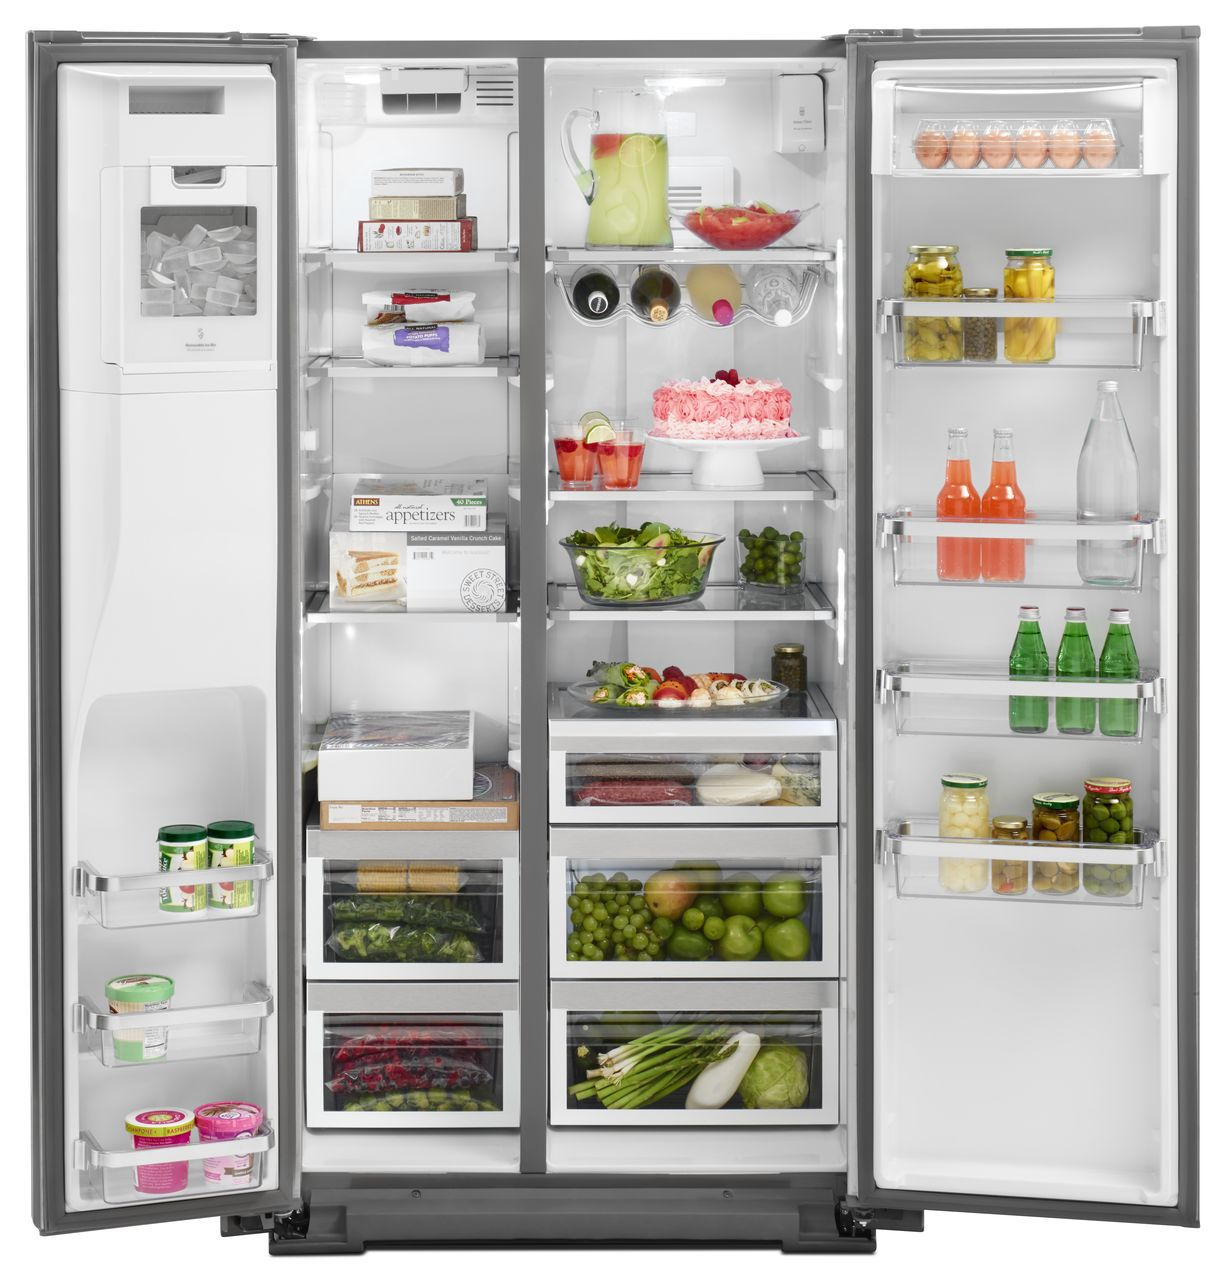 Kitchenaid Side By Side Refrigerator Krsc503ess